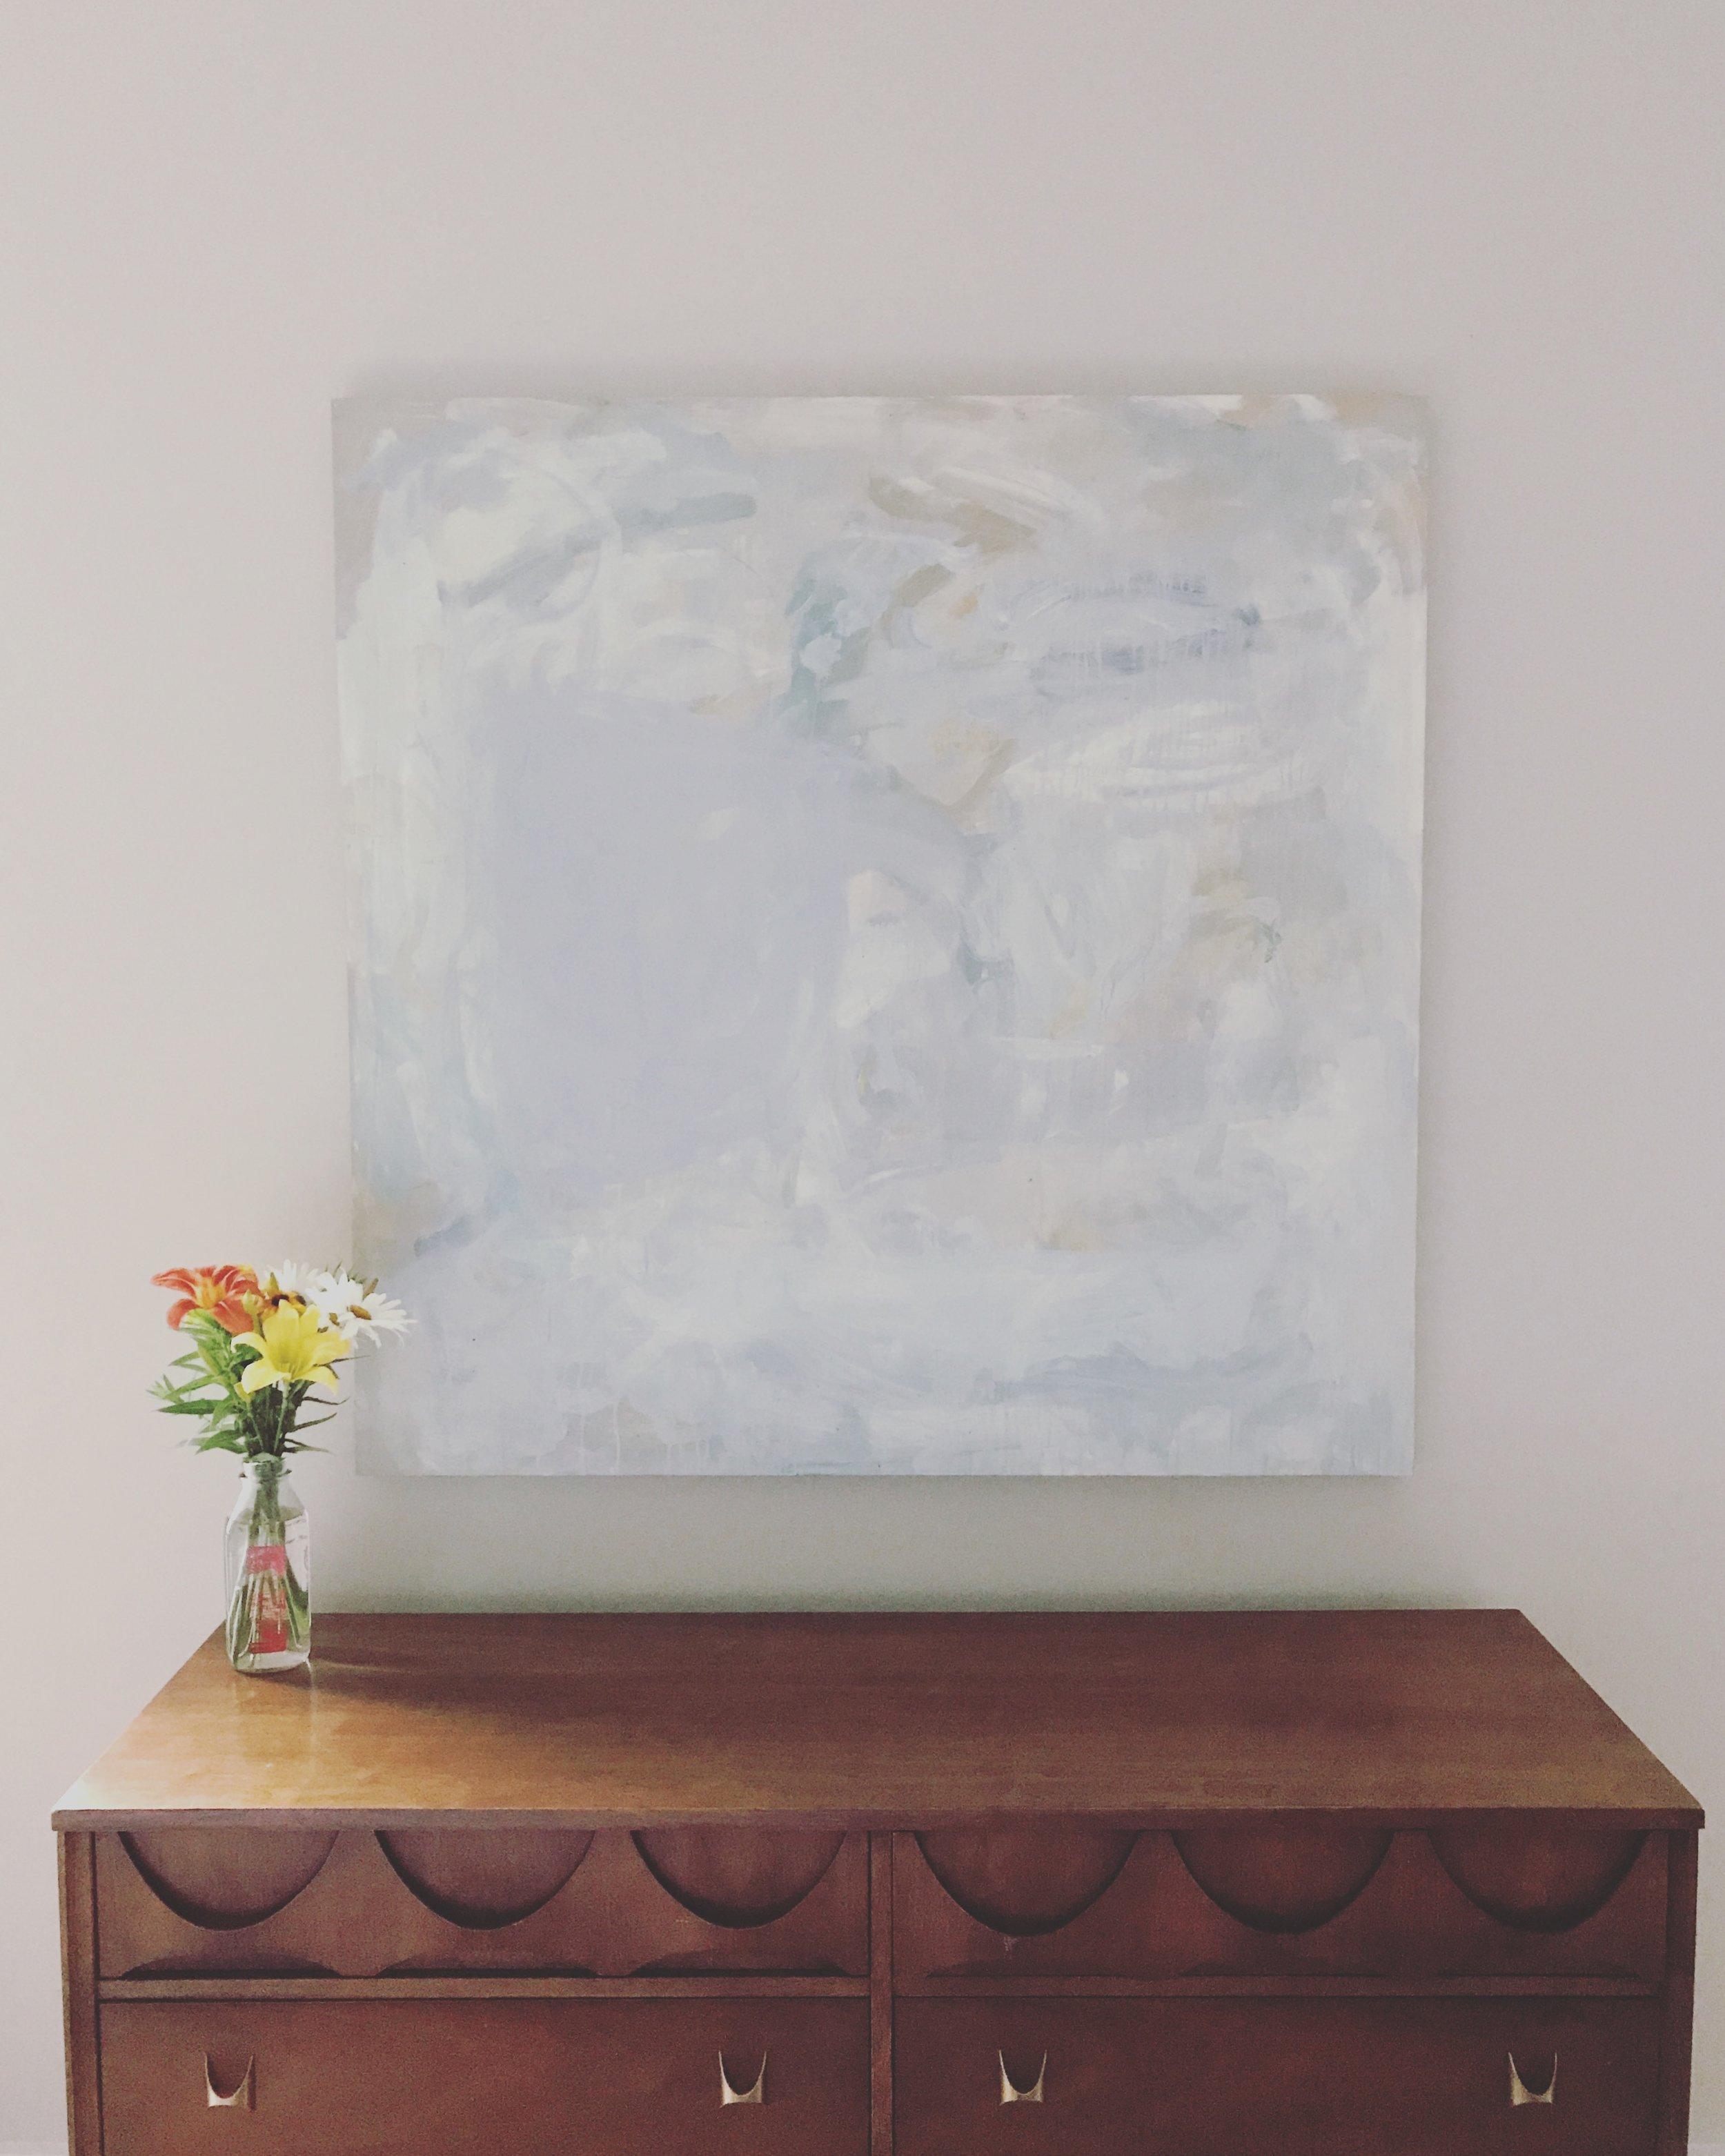 North, 121 cm x 121 cm, oil on panel